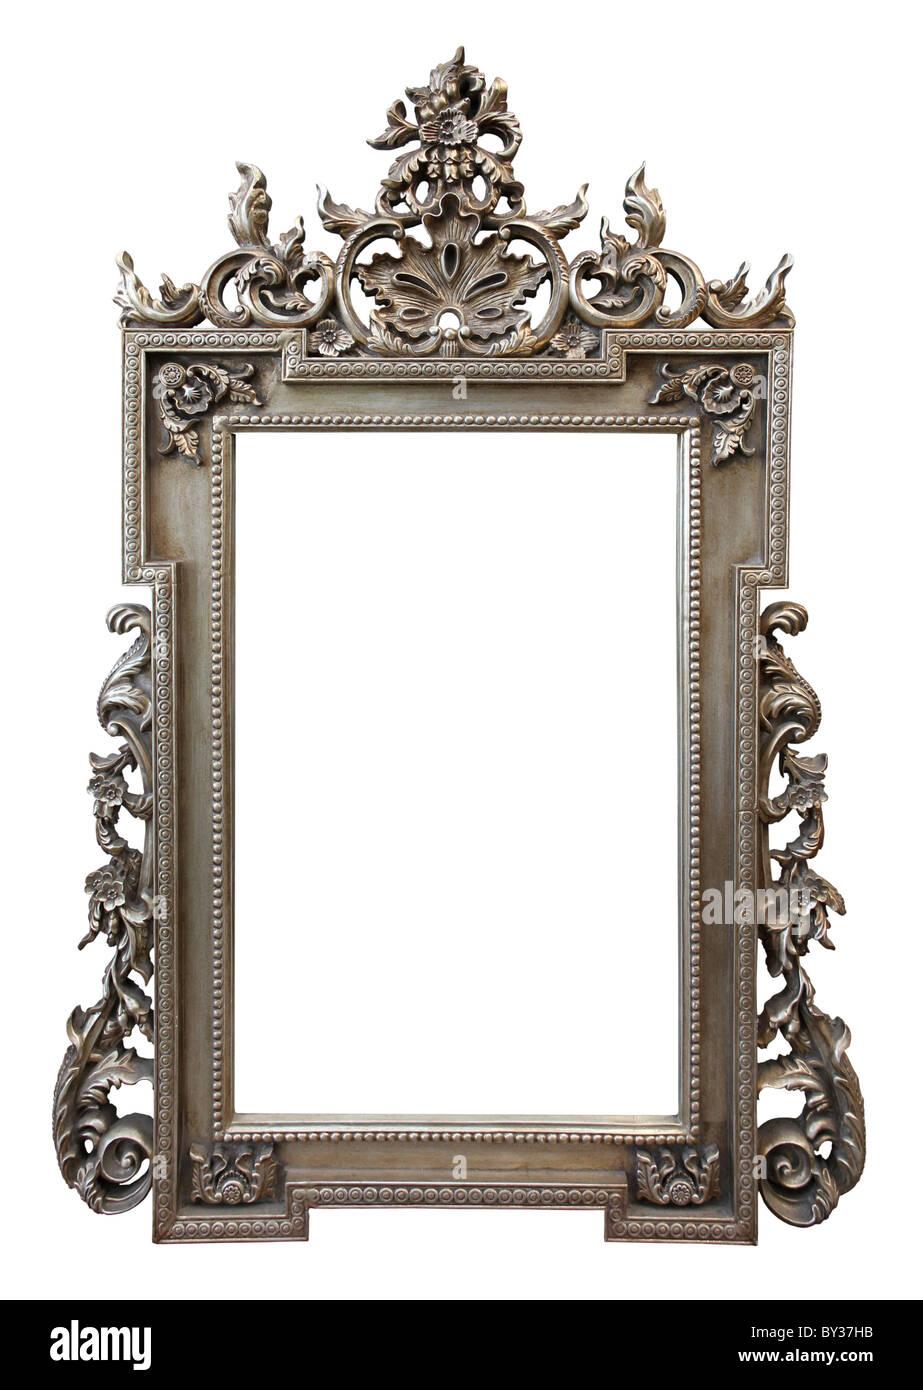 Decorative Frame Stockfotos & Decorative Frame Bilder - Alamy